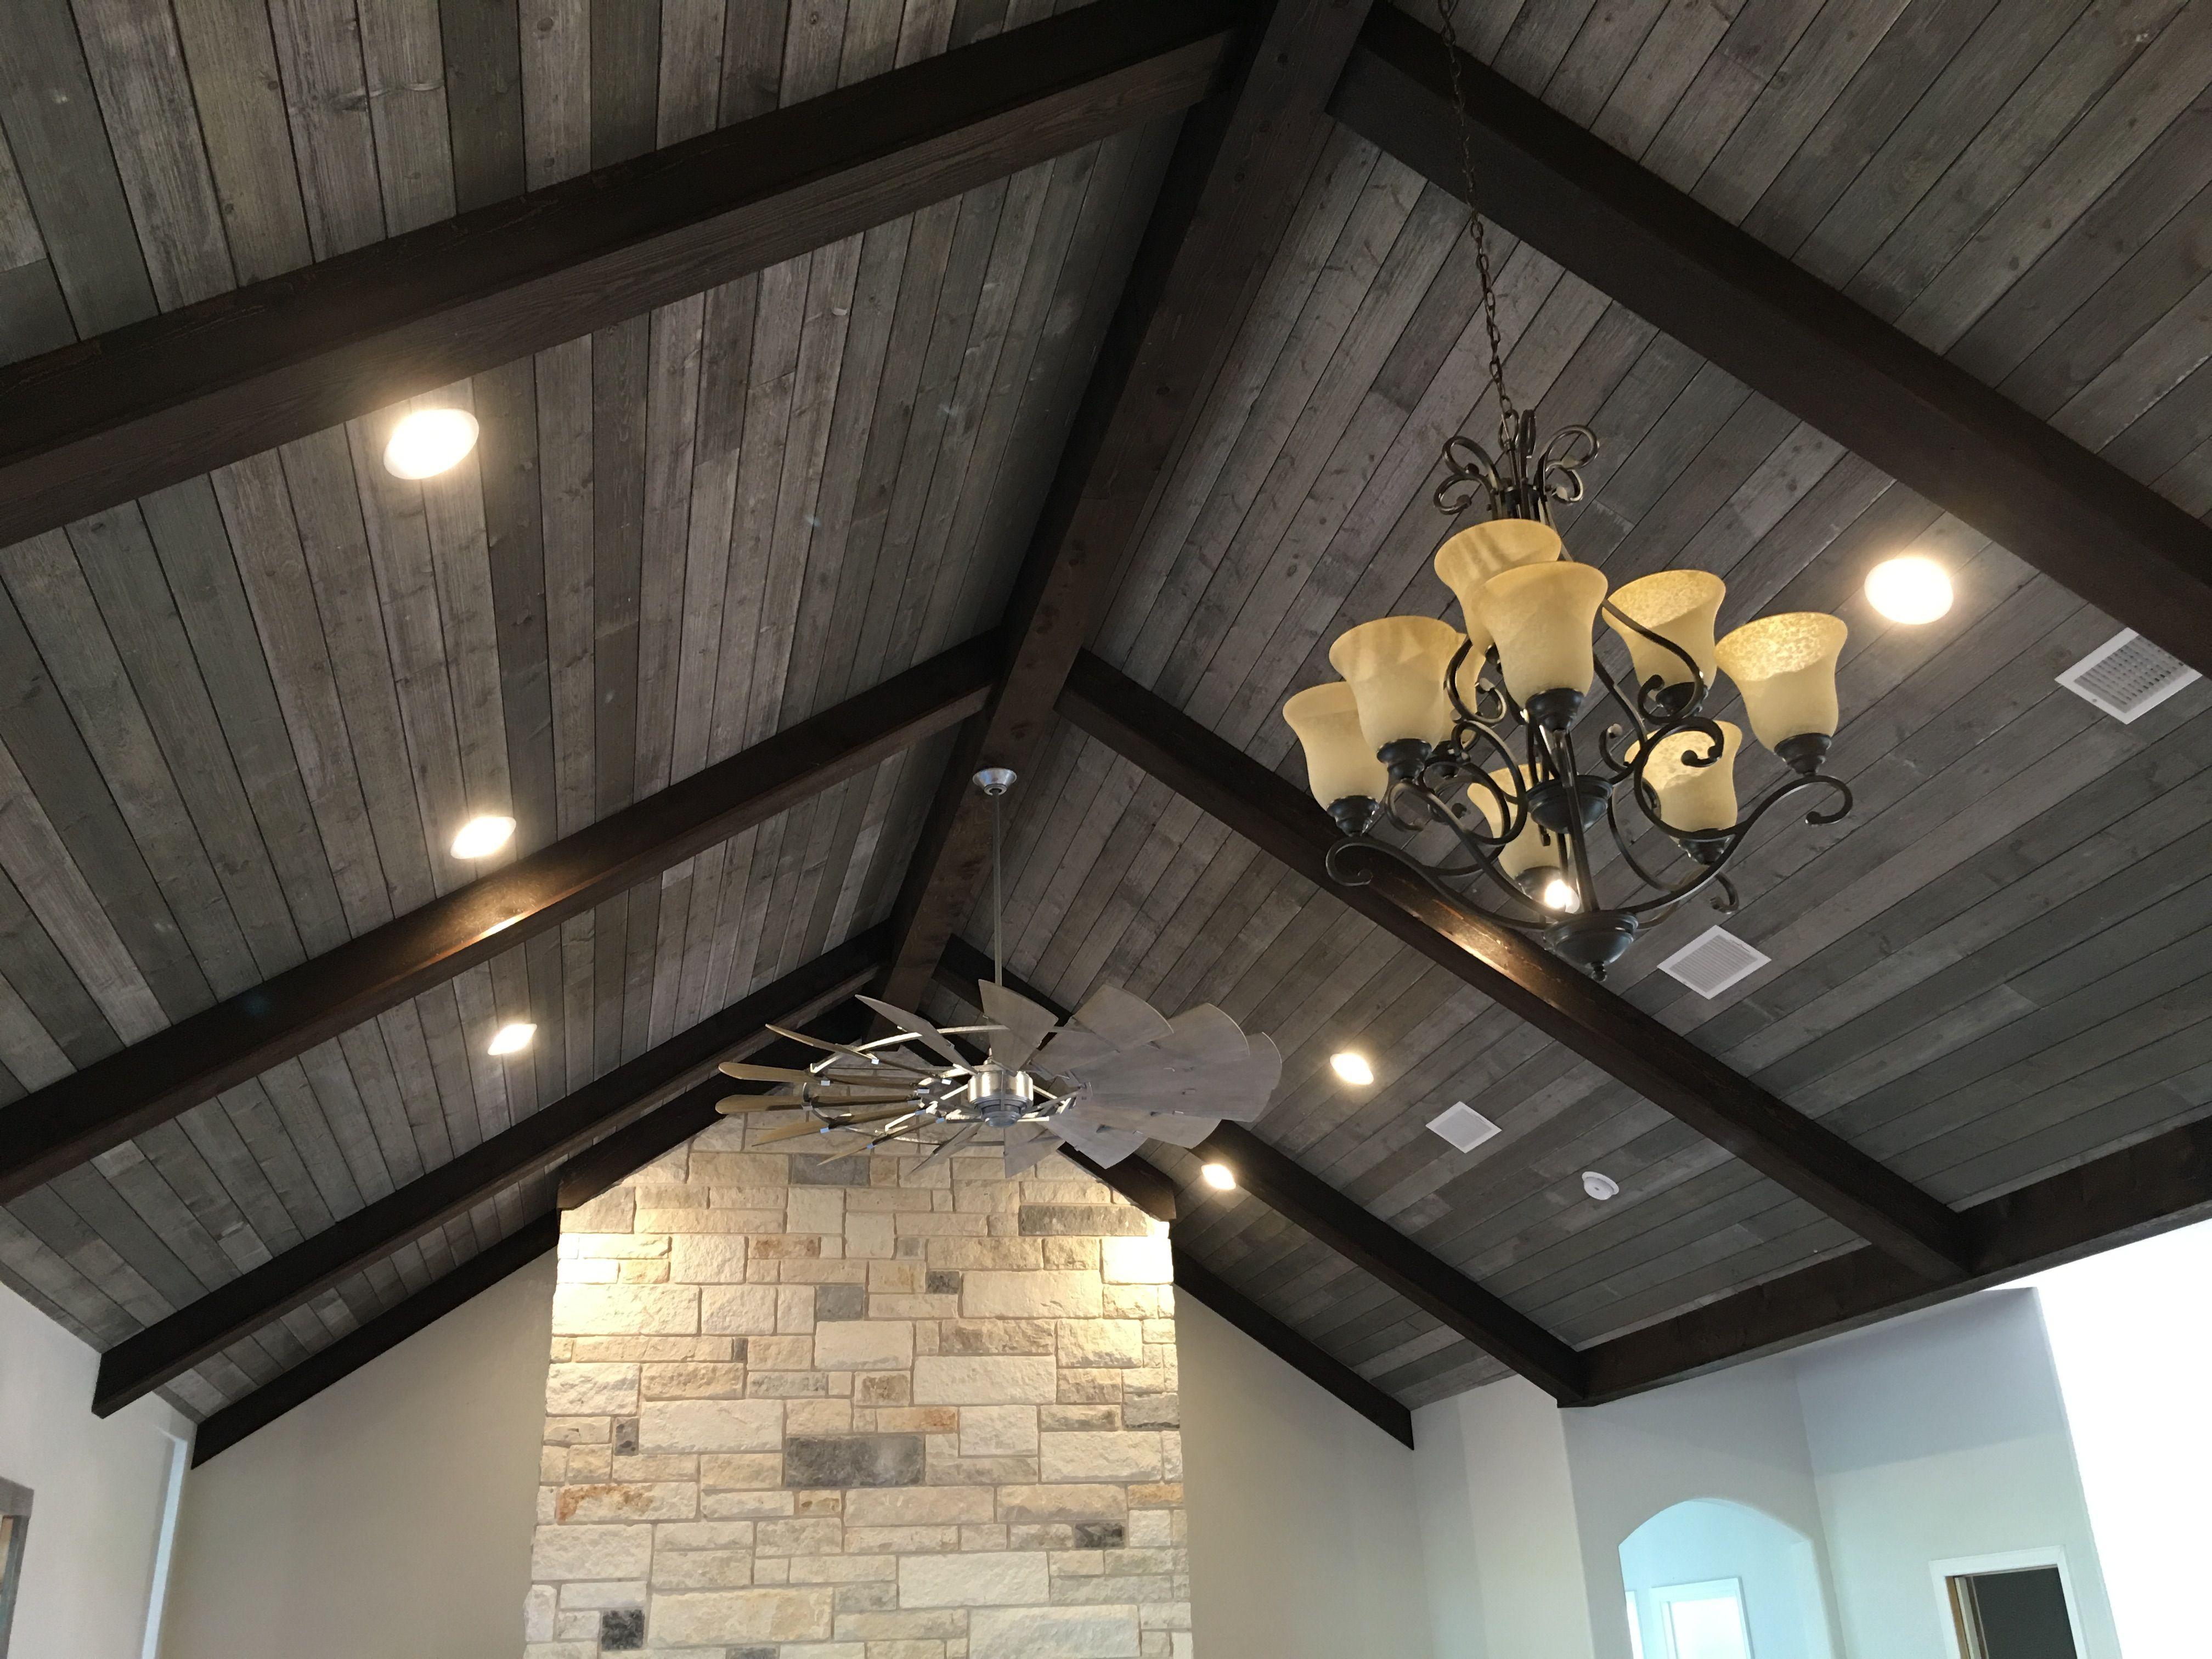 Windmill ceiling fan Chisholm Trail Custom Homes